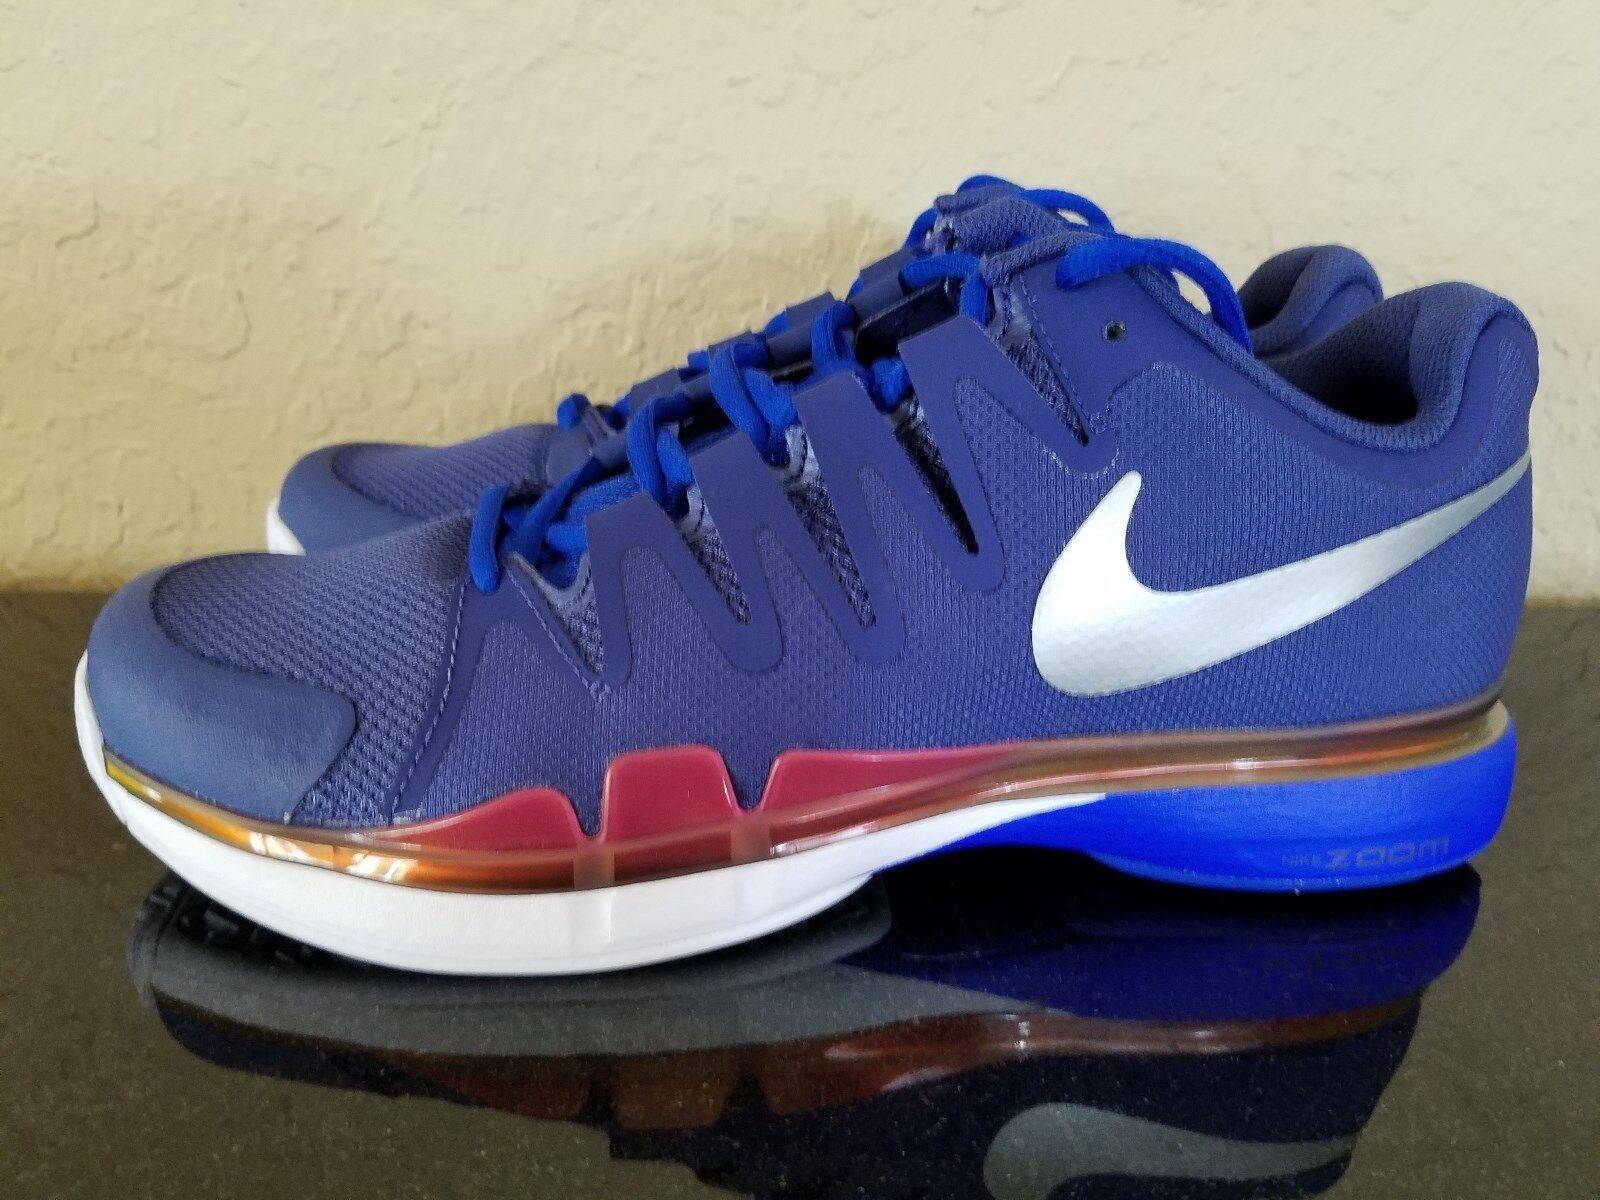 Nike Zoom  Vapor 9.5 Tour Tennis scarpe blu Roland Garros 2016  vendita di offerte